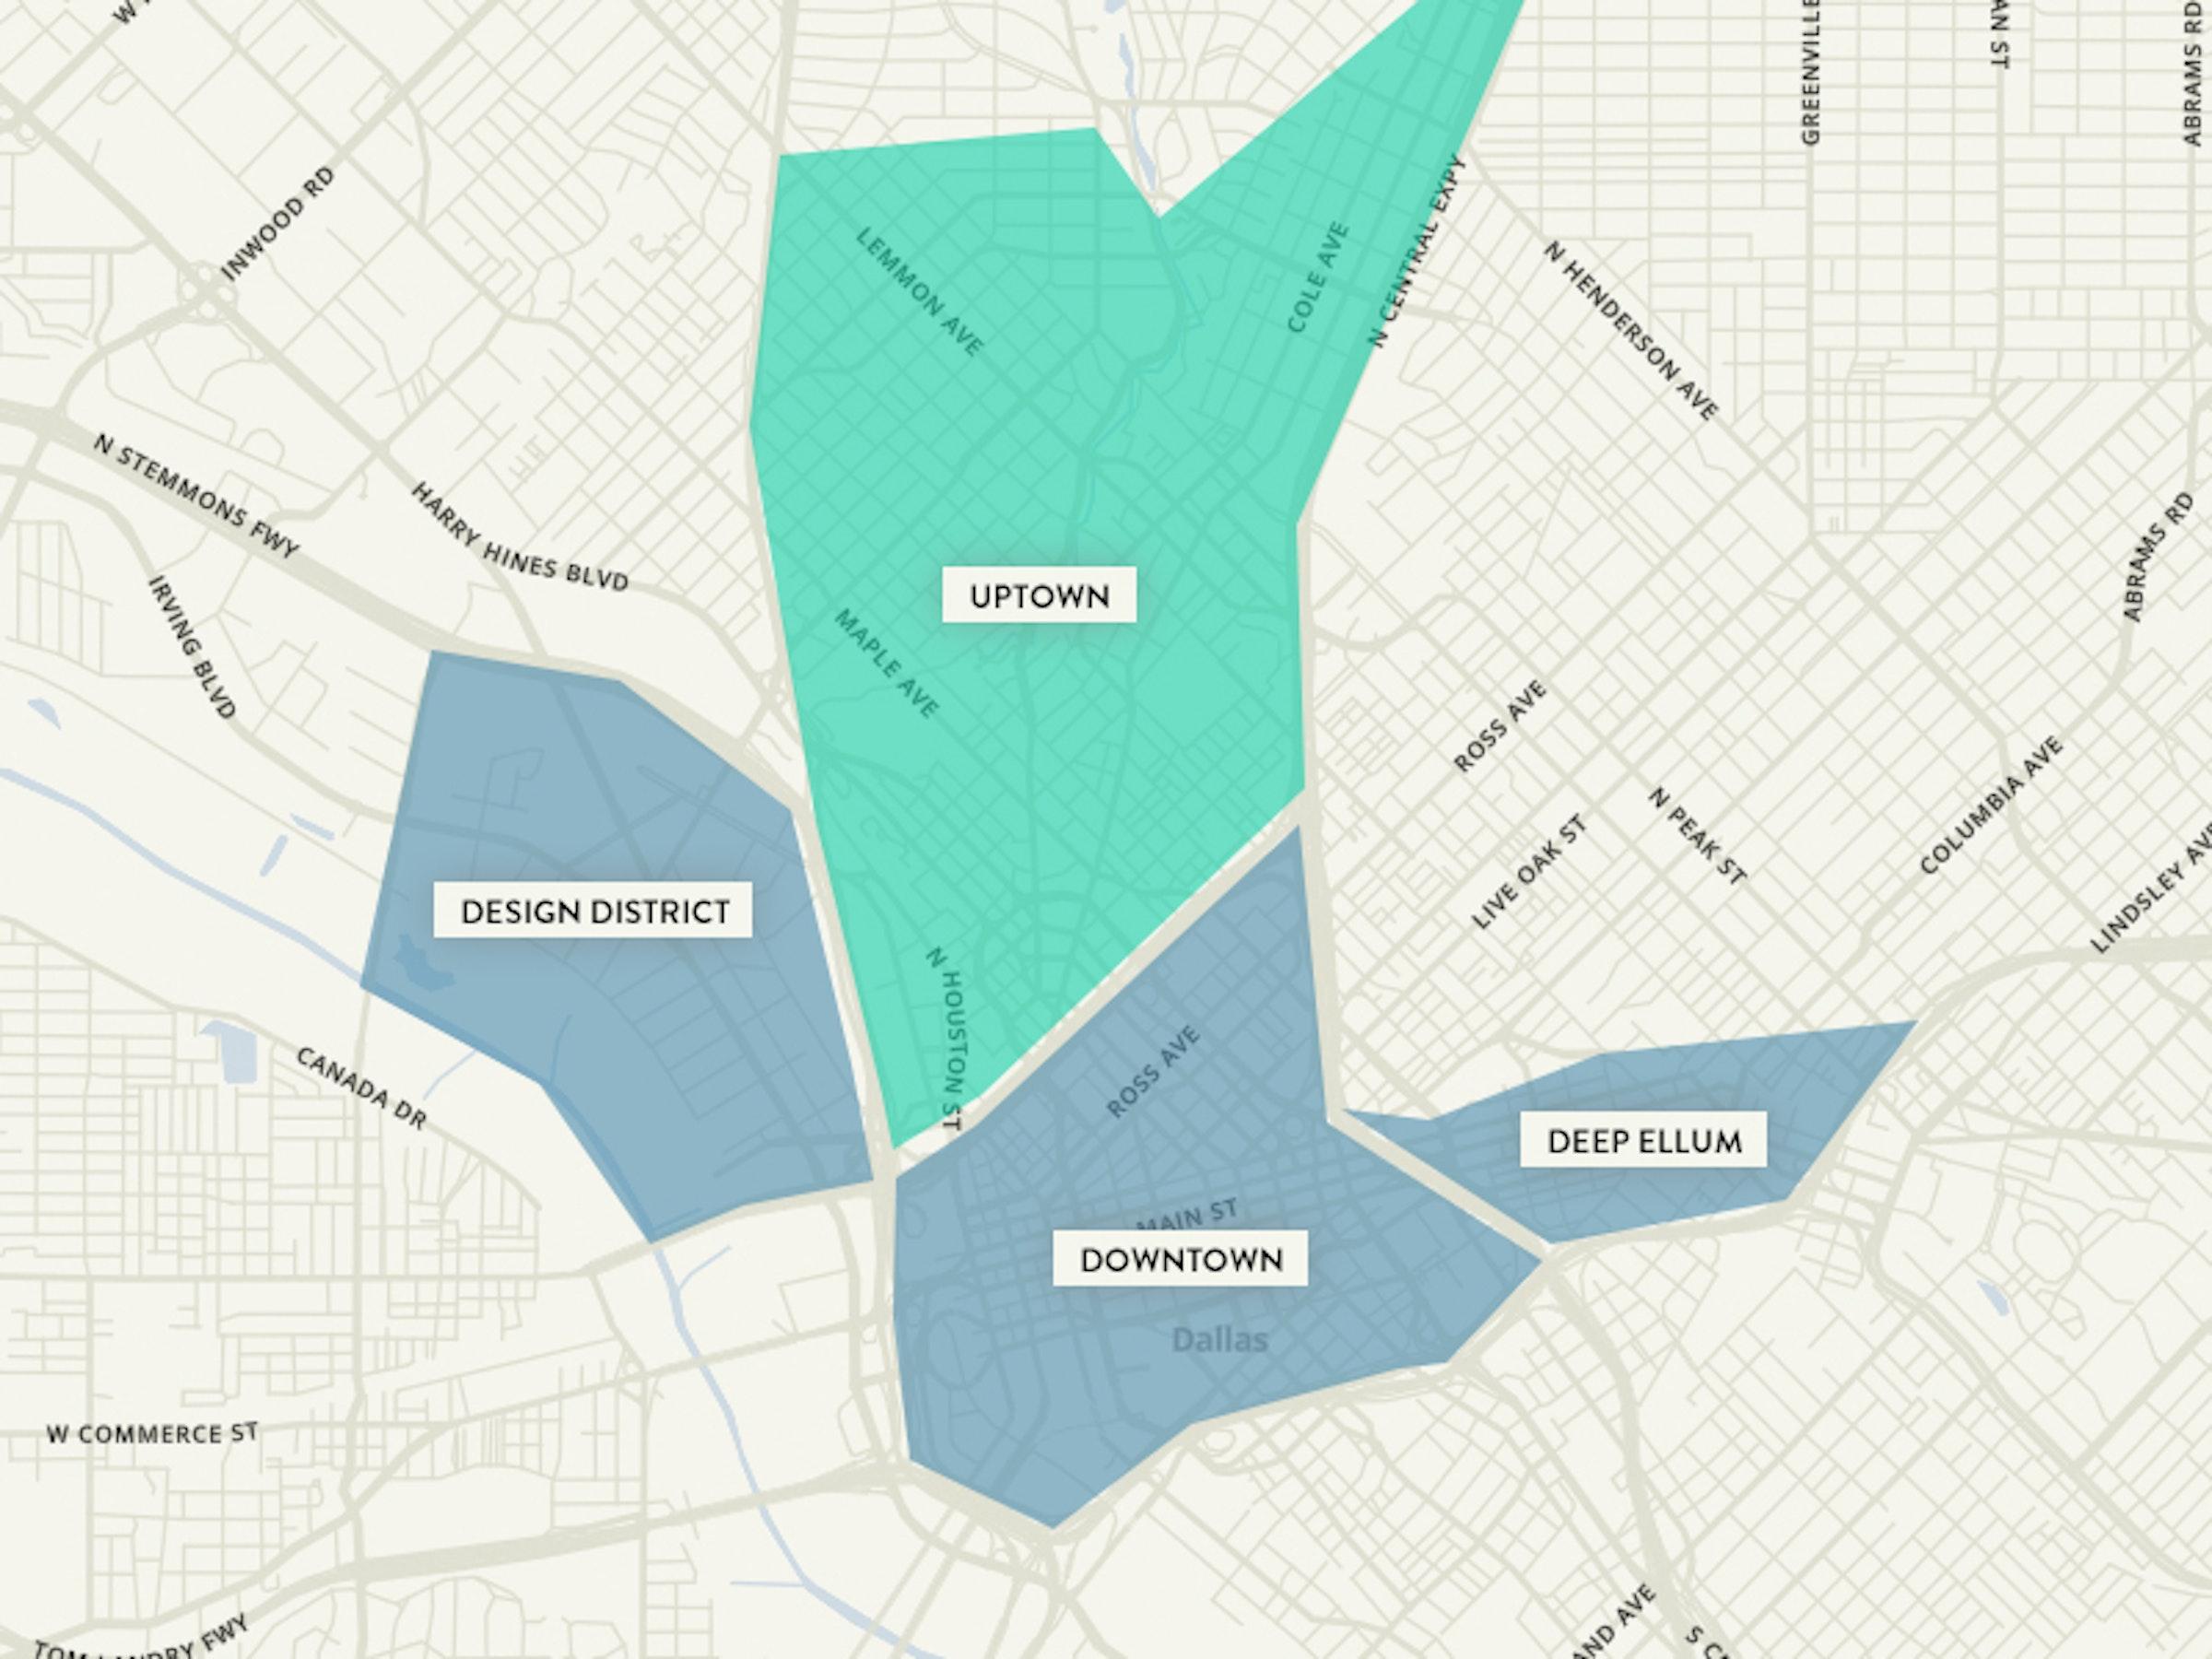 map of uptown dallas Uptown Dallas Top Restaurants And Things To Do map of uptown dallas